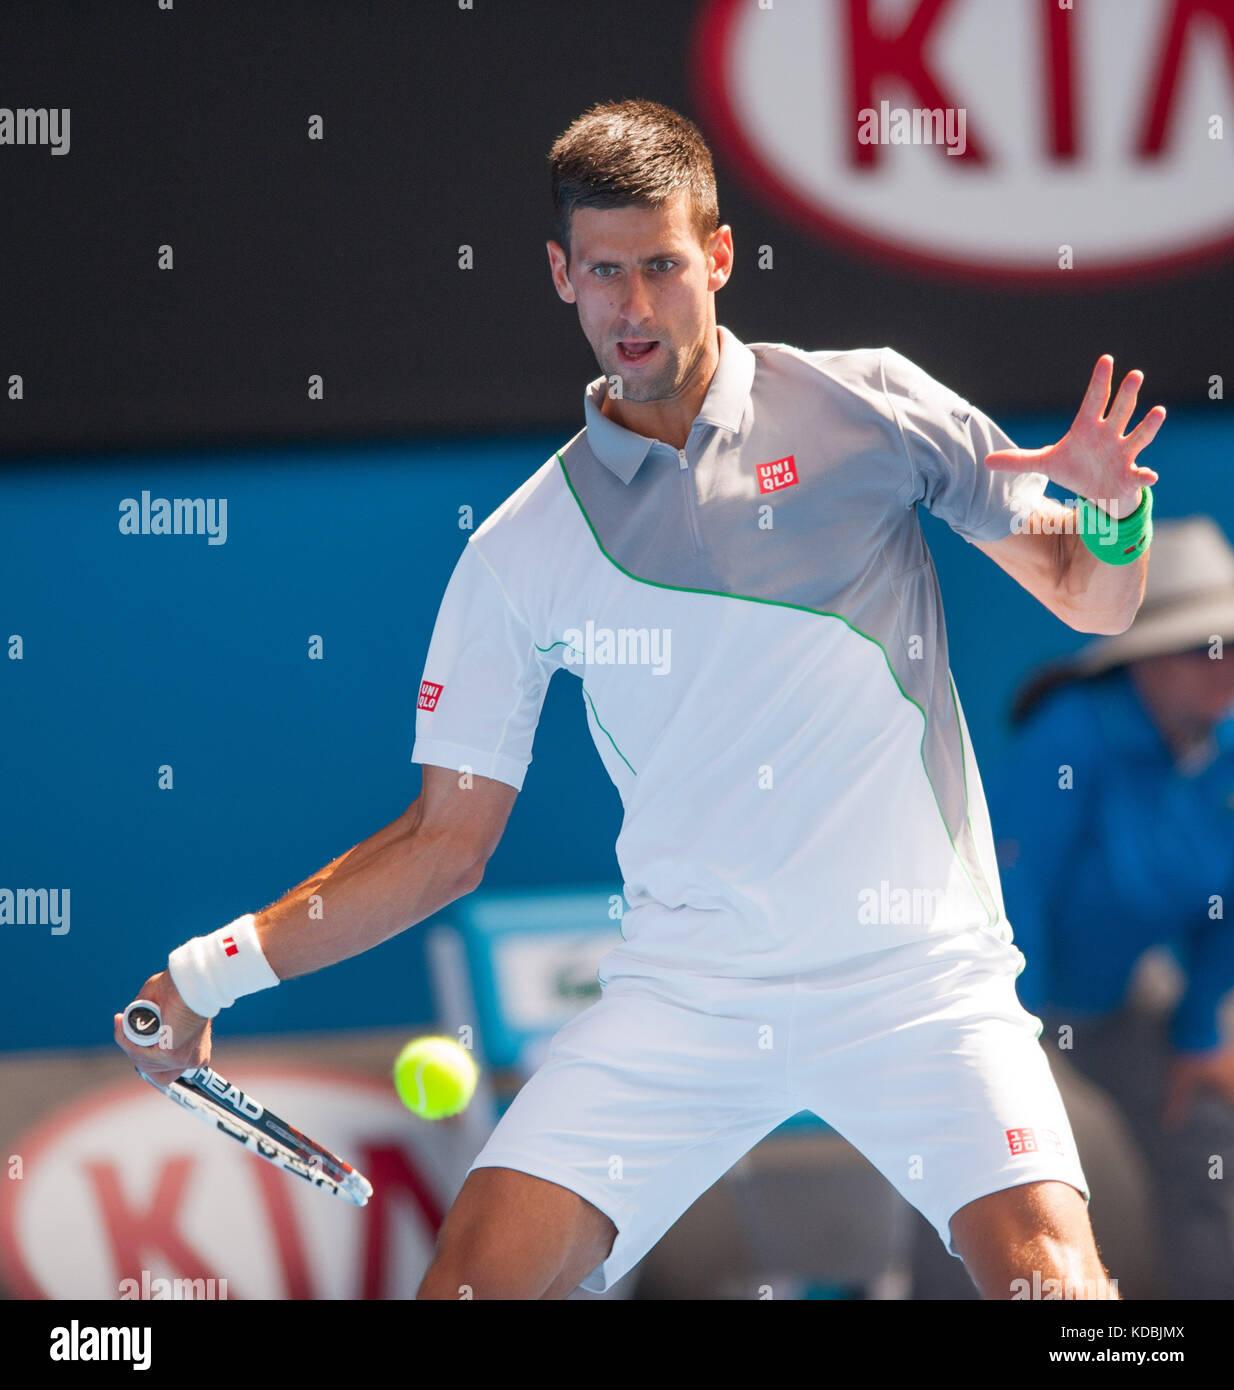 Novak Djokovic(SRB) faced Italian tennis bad boy F. Fognini in day seven of the 2014 Australian Open in Melbourne. - Stock Image